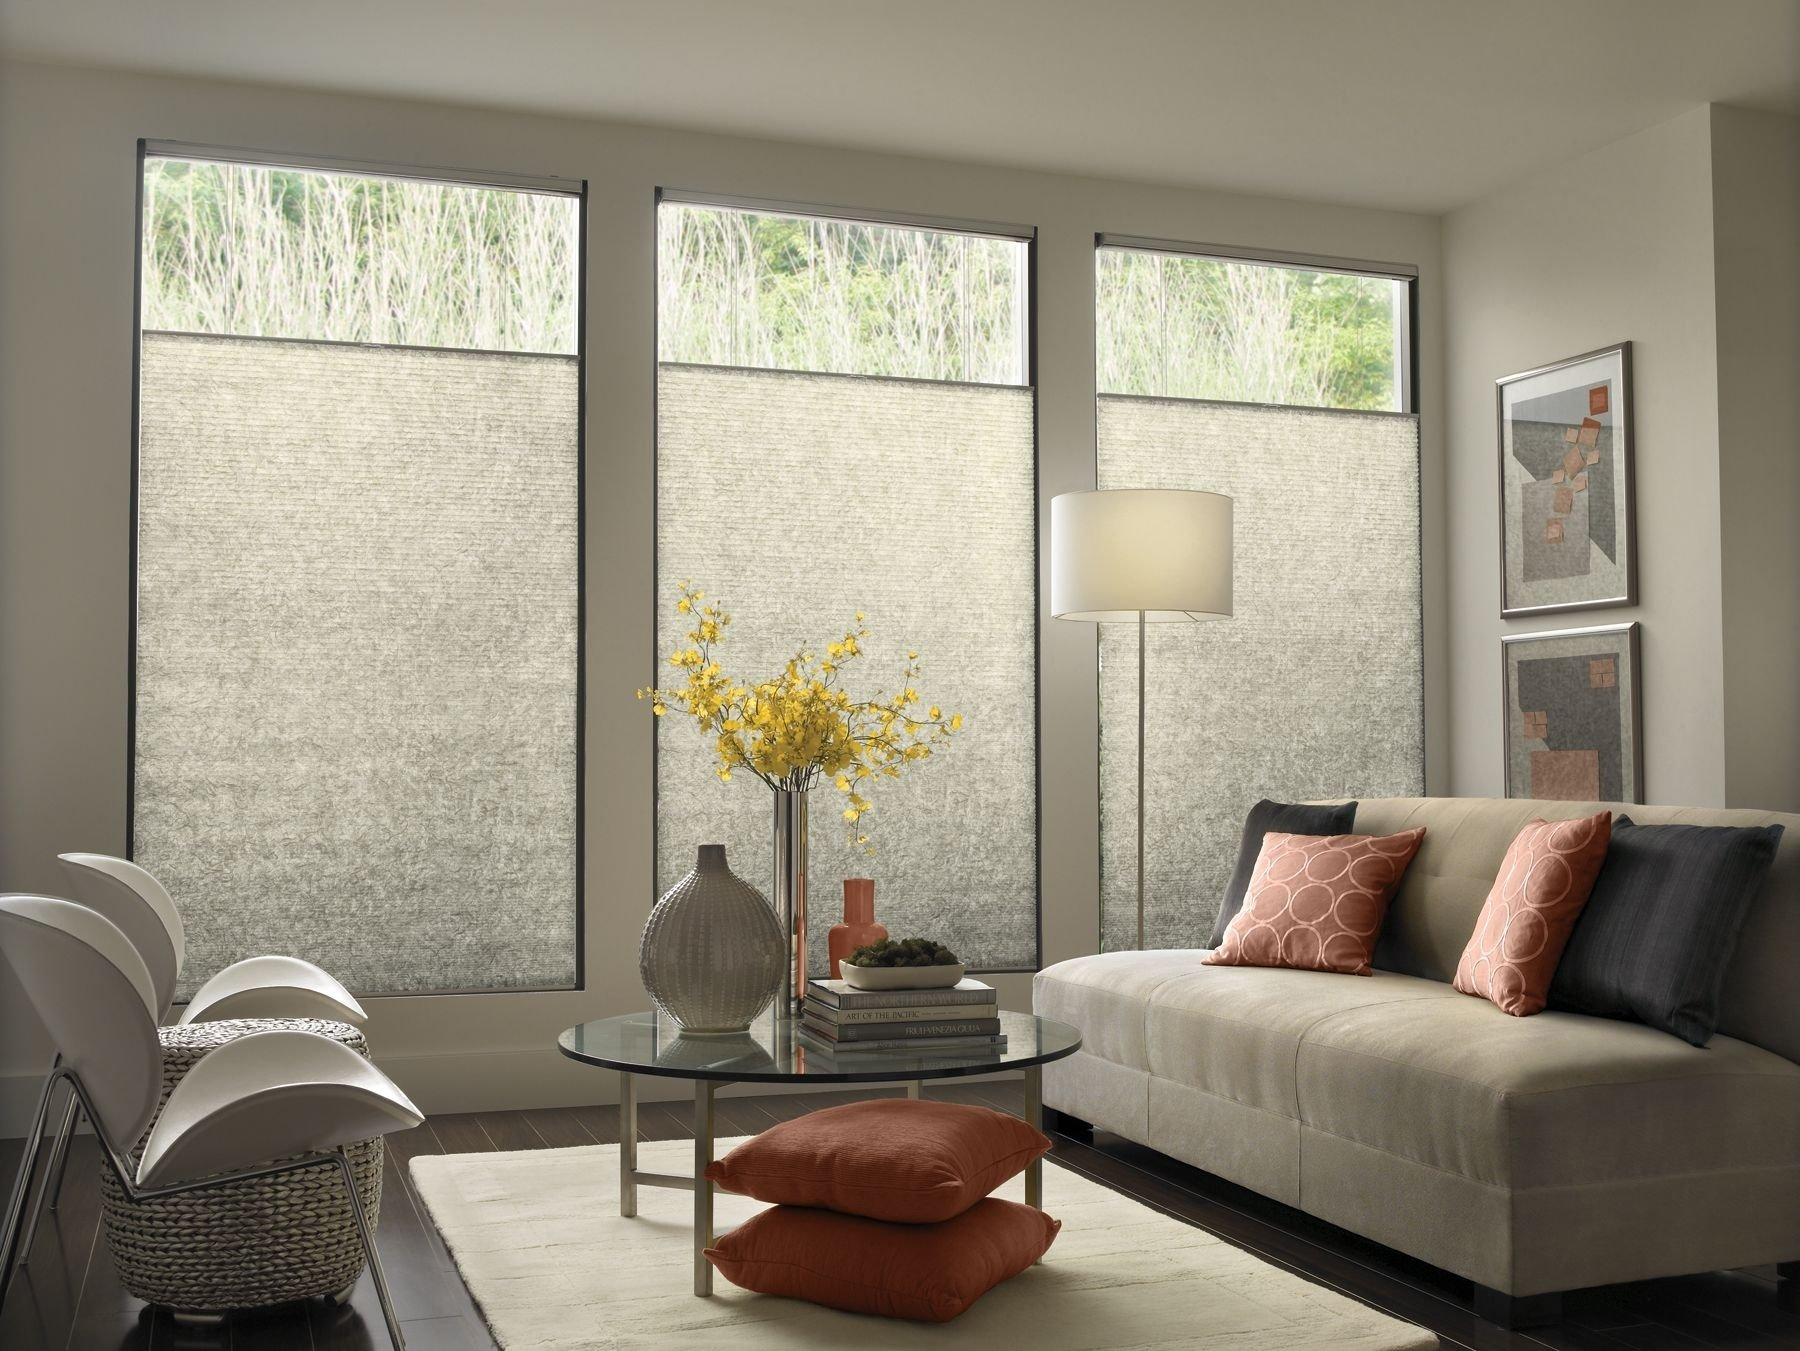 10 Cute Living Room Window Treatment Ideas modern contemporary window treatments with mid century modern sofa 1 2021